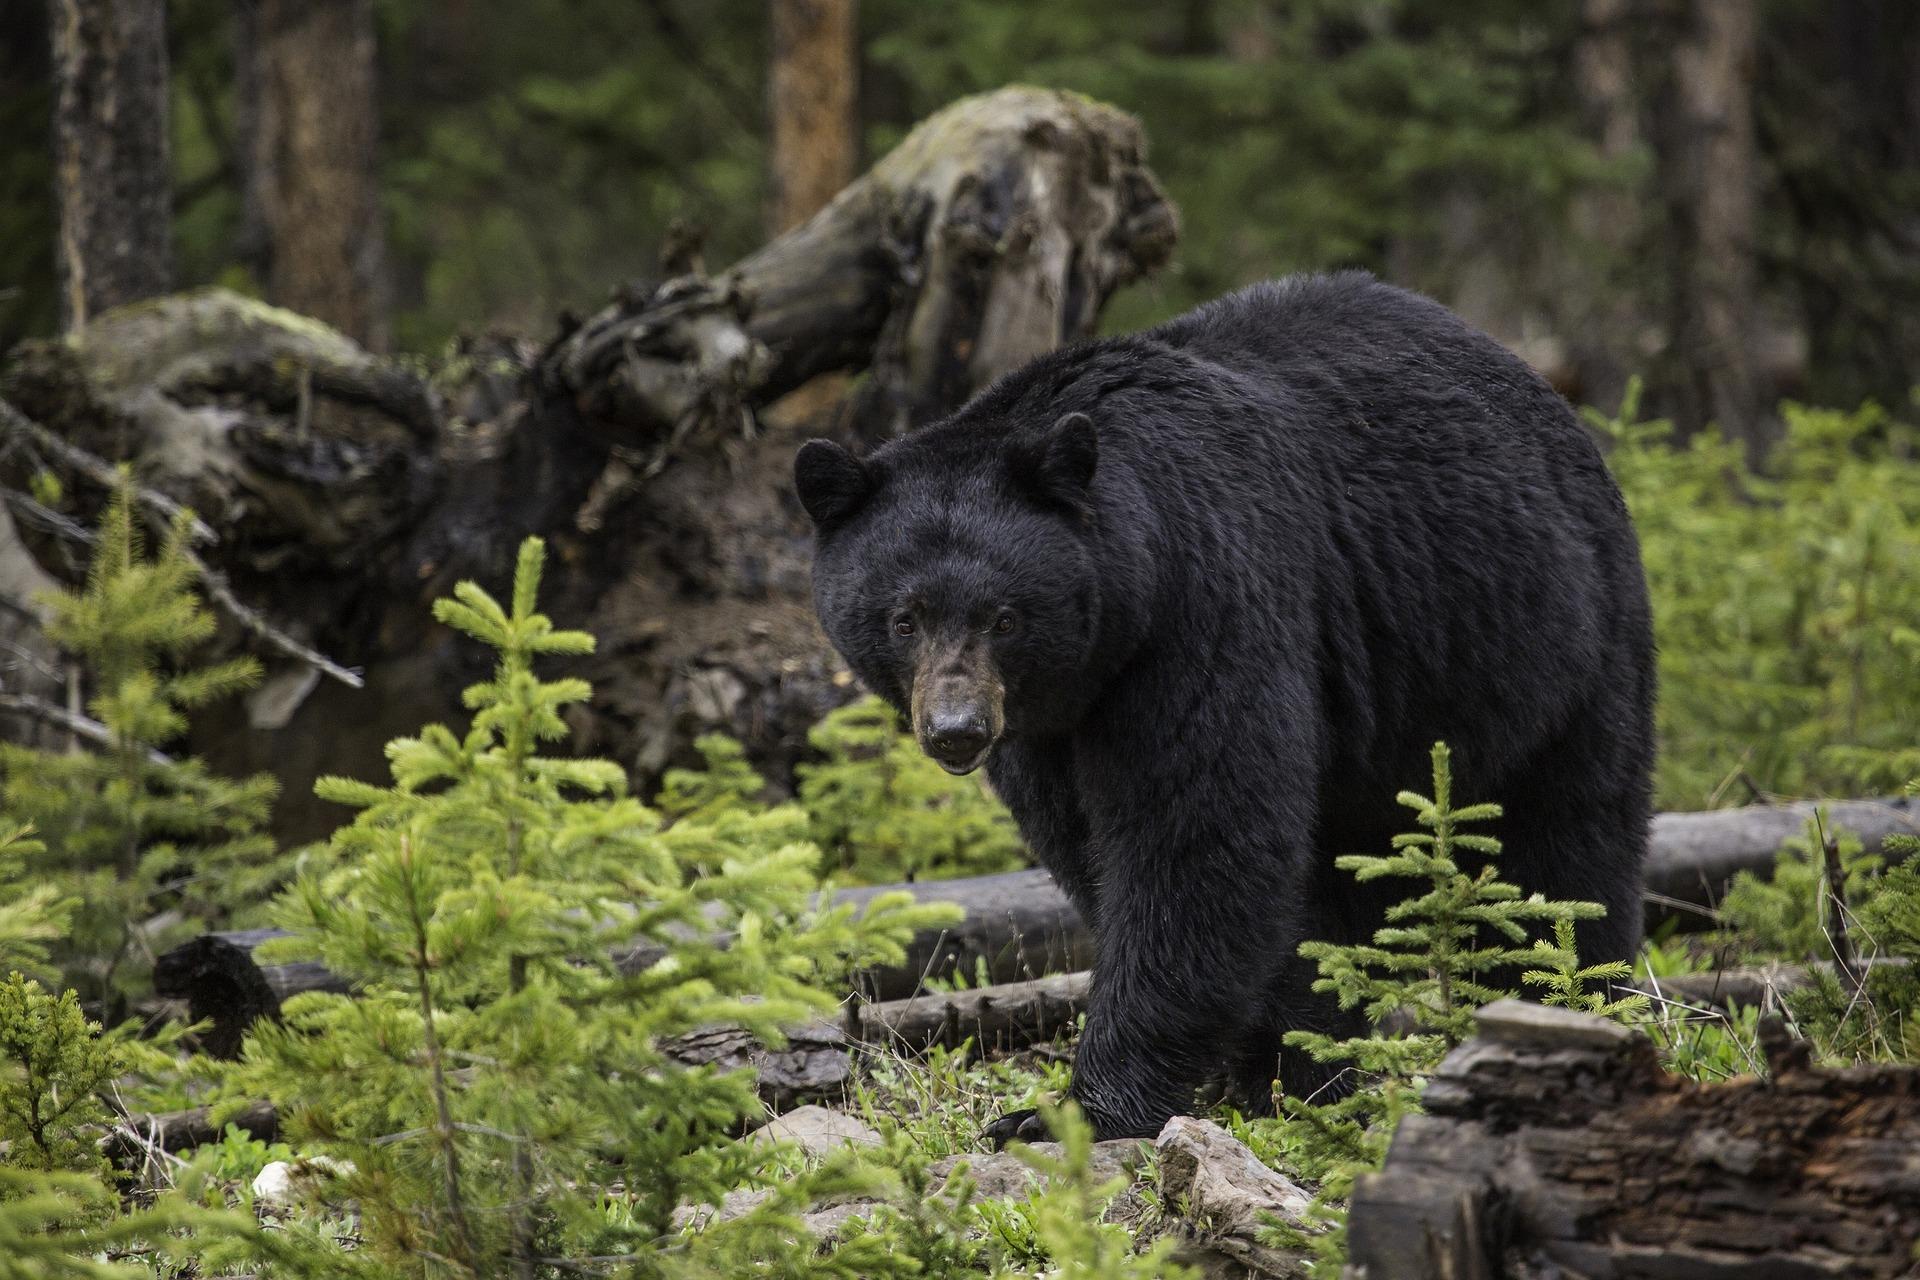 A black bear walking through the forest.